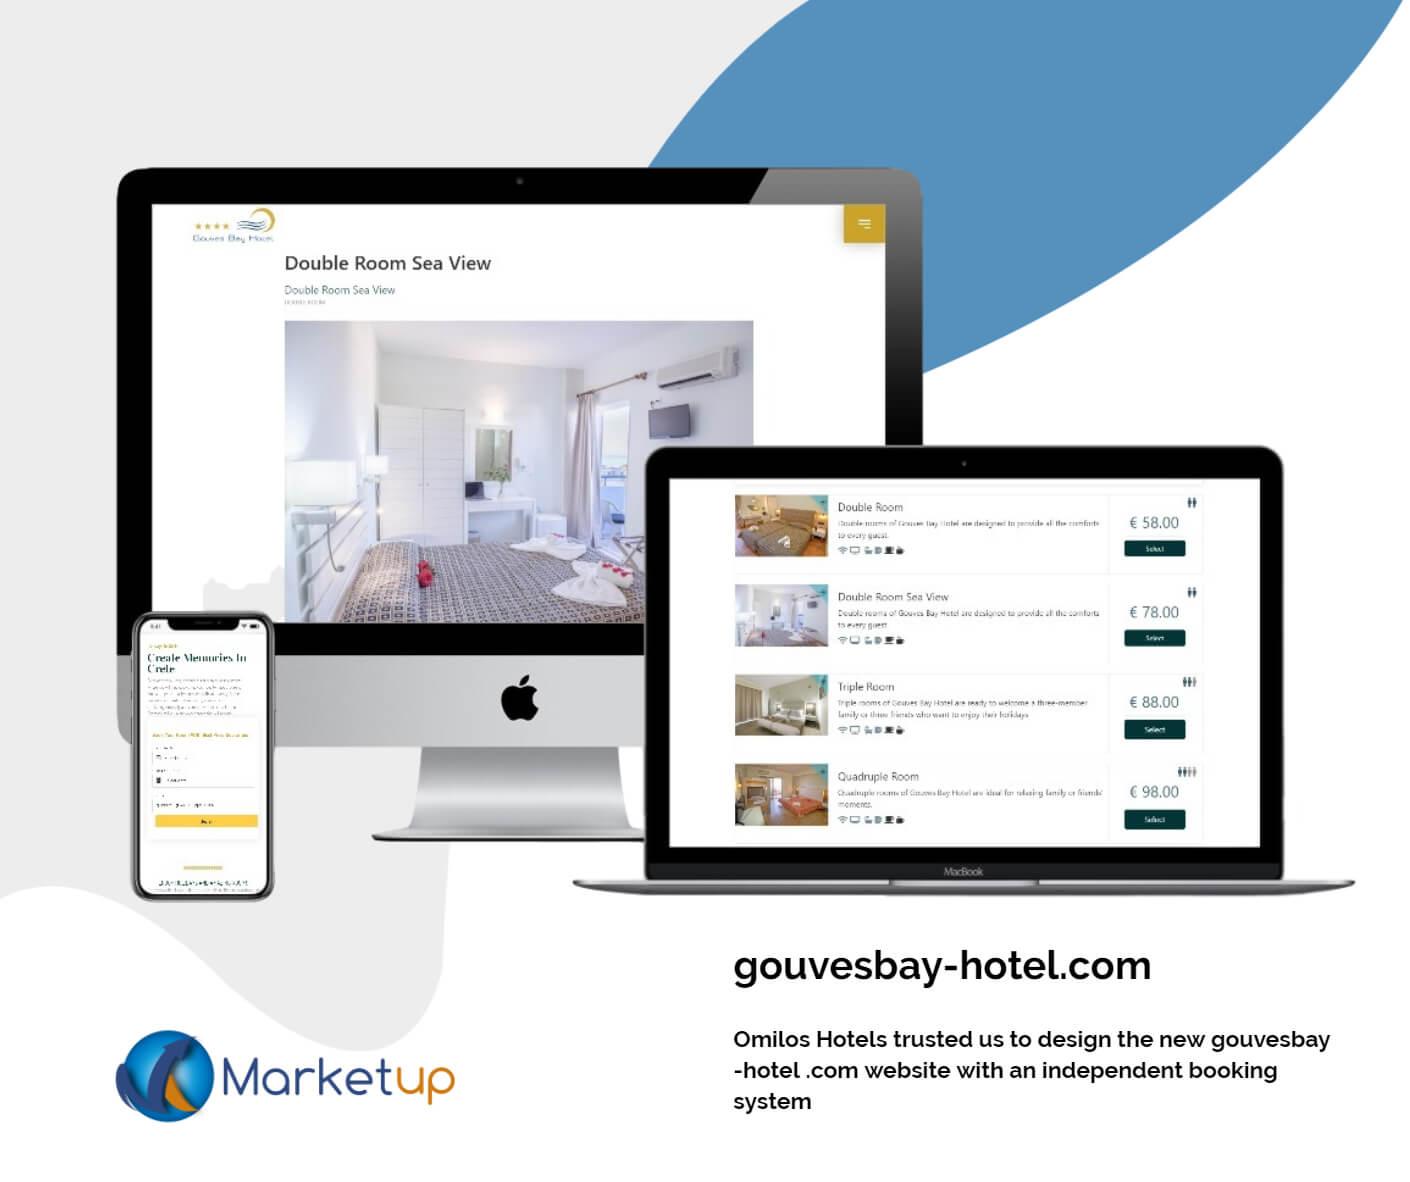 hotel-project-marketup